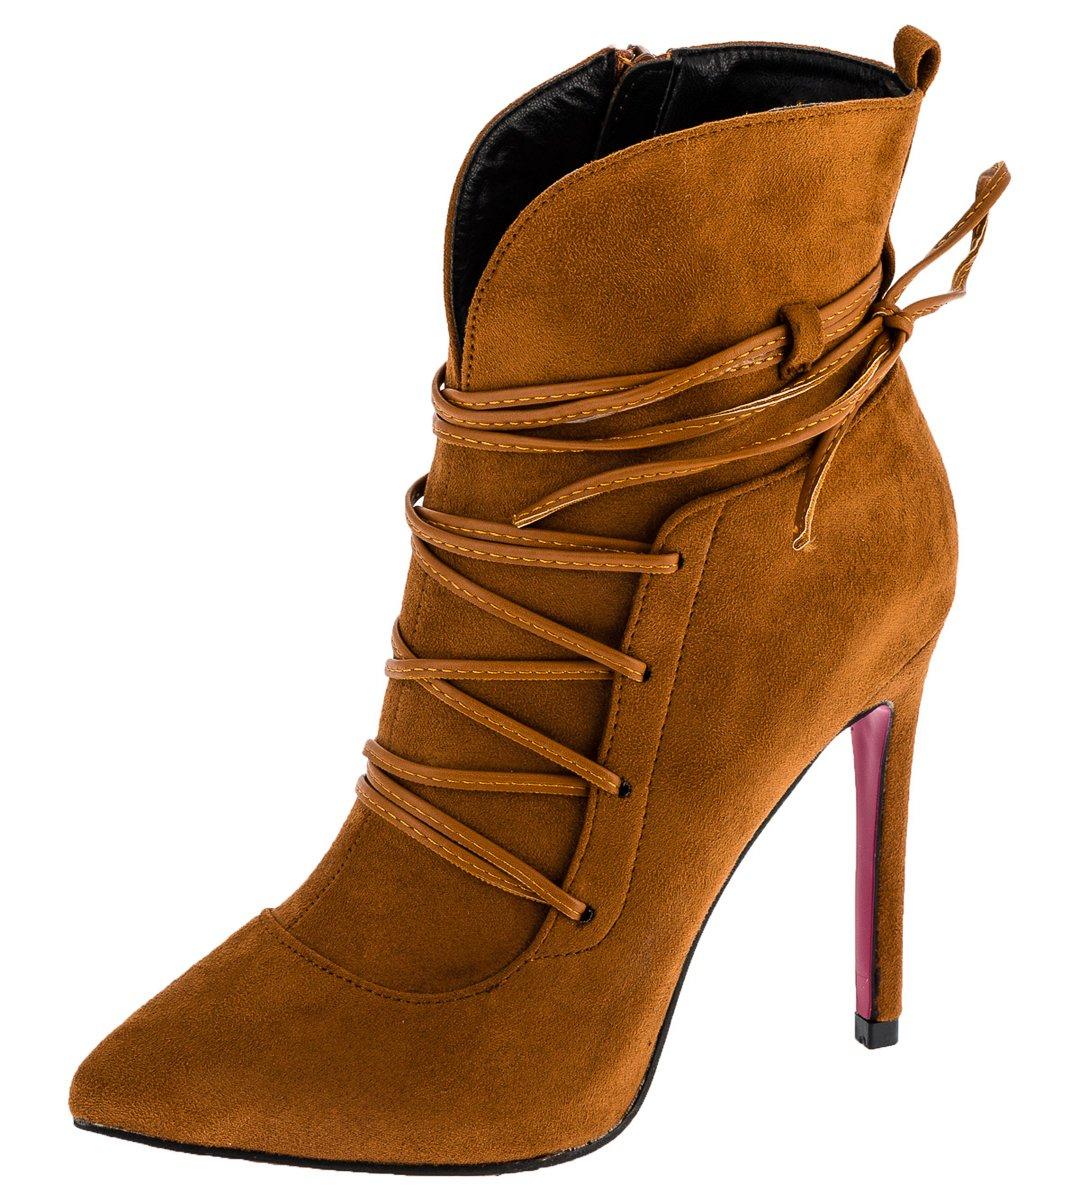 Shayenne Damen Stiefeletten Stiletto Stiefel High Heels Kurzschaft Boots Pumps Schuhe  35 EU|Braun